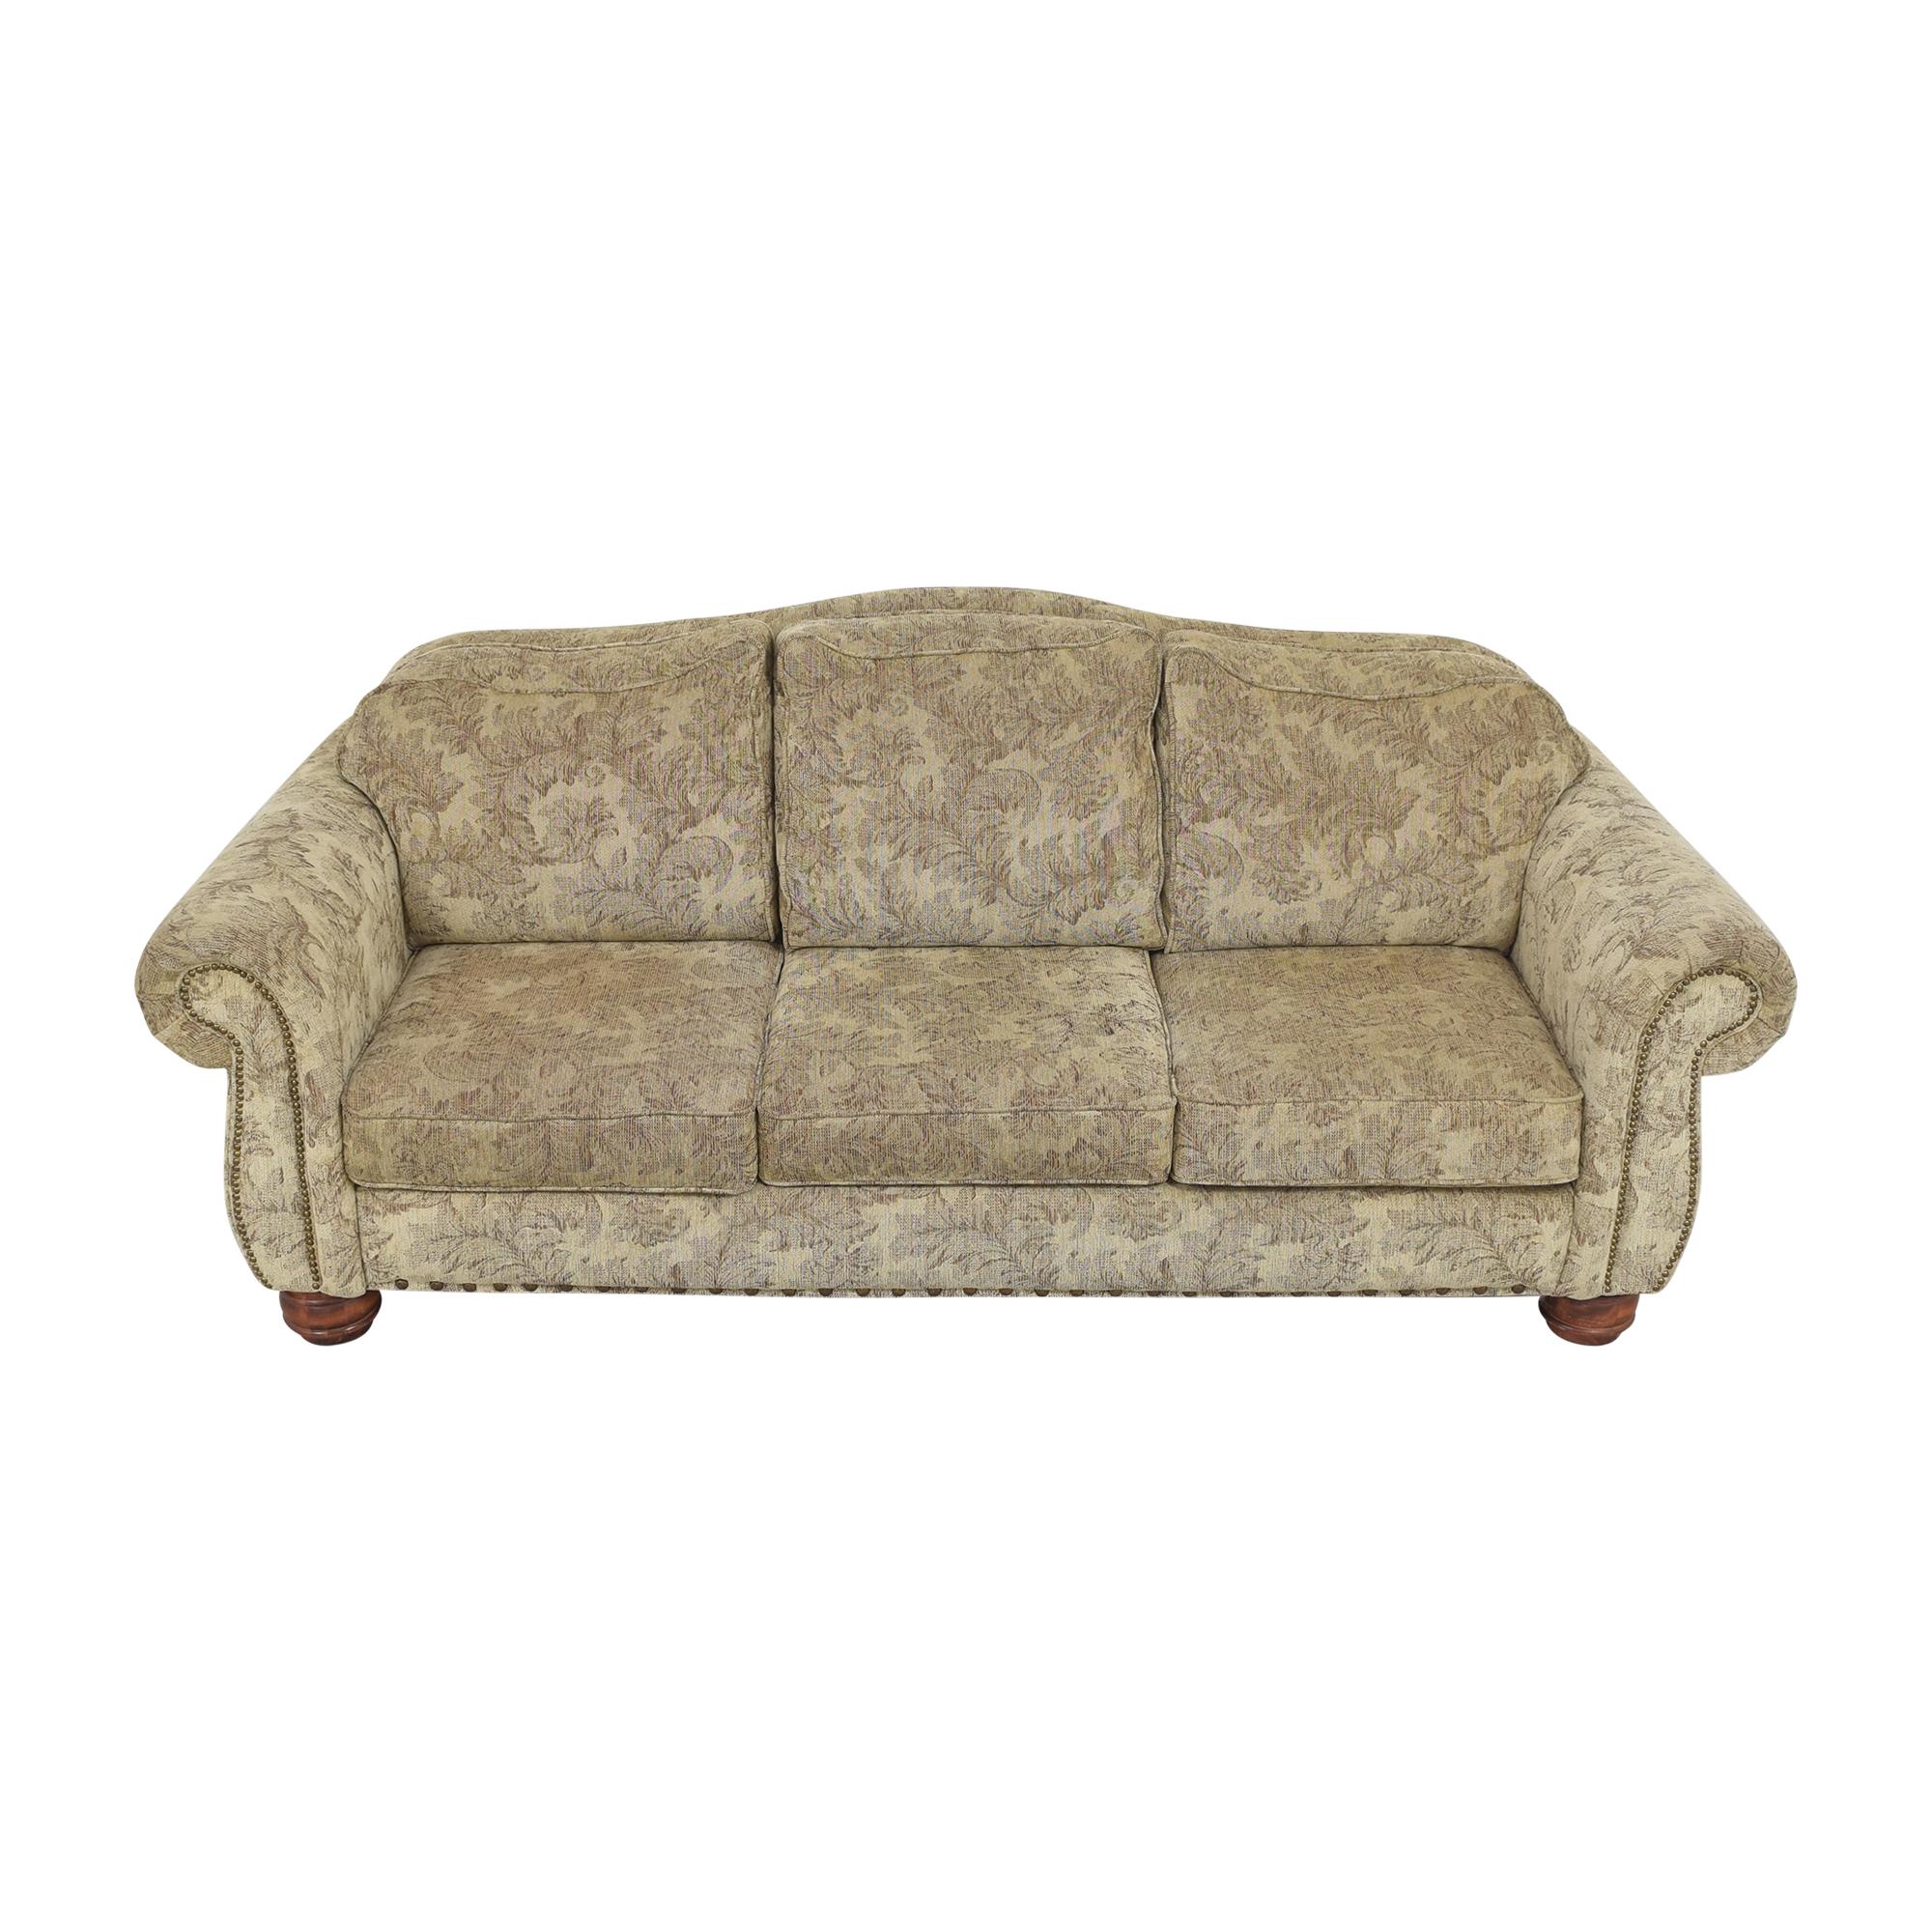 Jackson Furniture Jackson Furniture Roll Arm Nailhead Sofa for sale